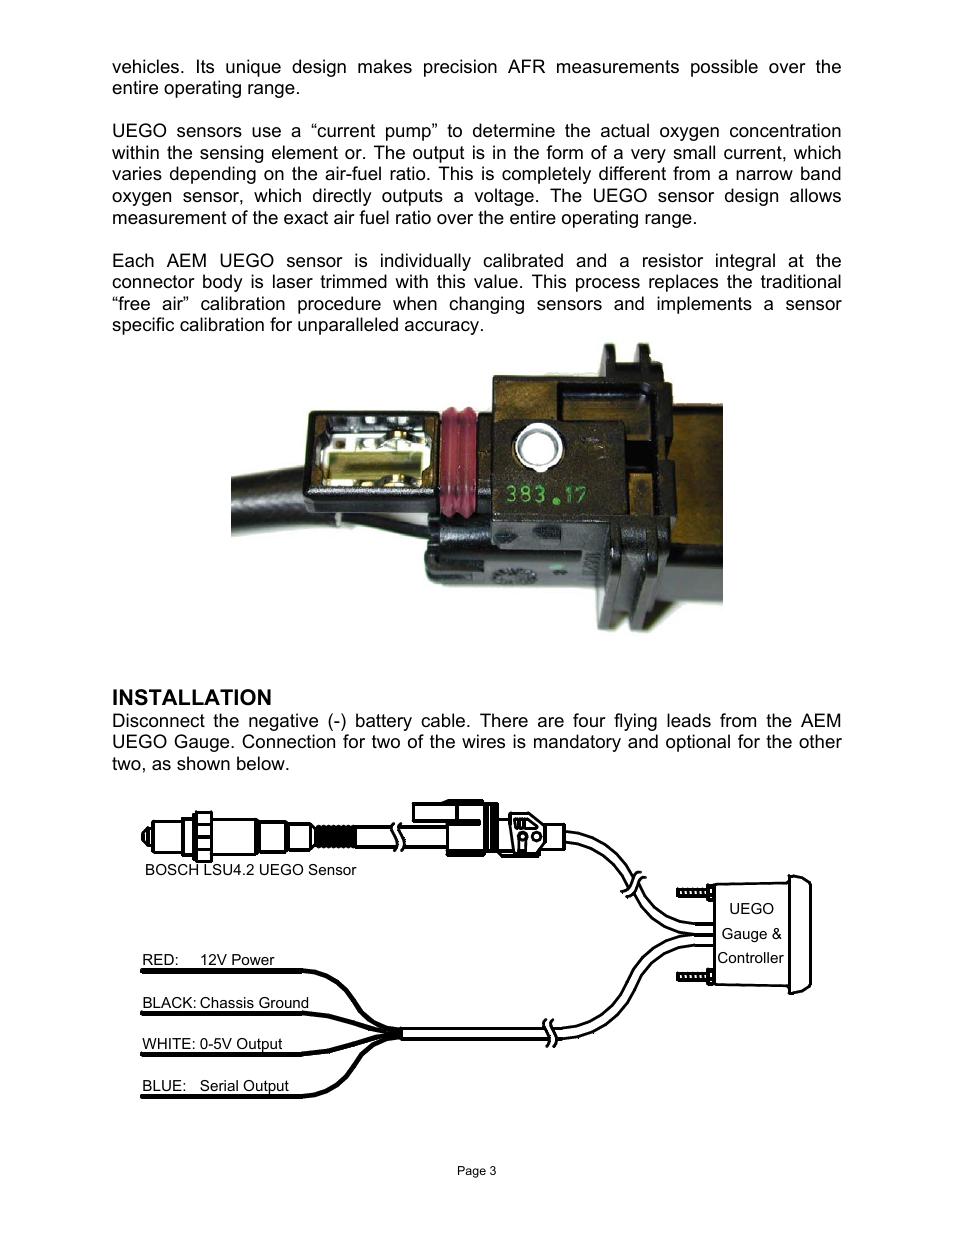 Aem Wideband 35-8460 Wiring Diagram from www.manualsdir.com